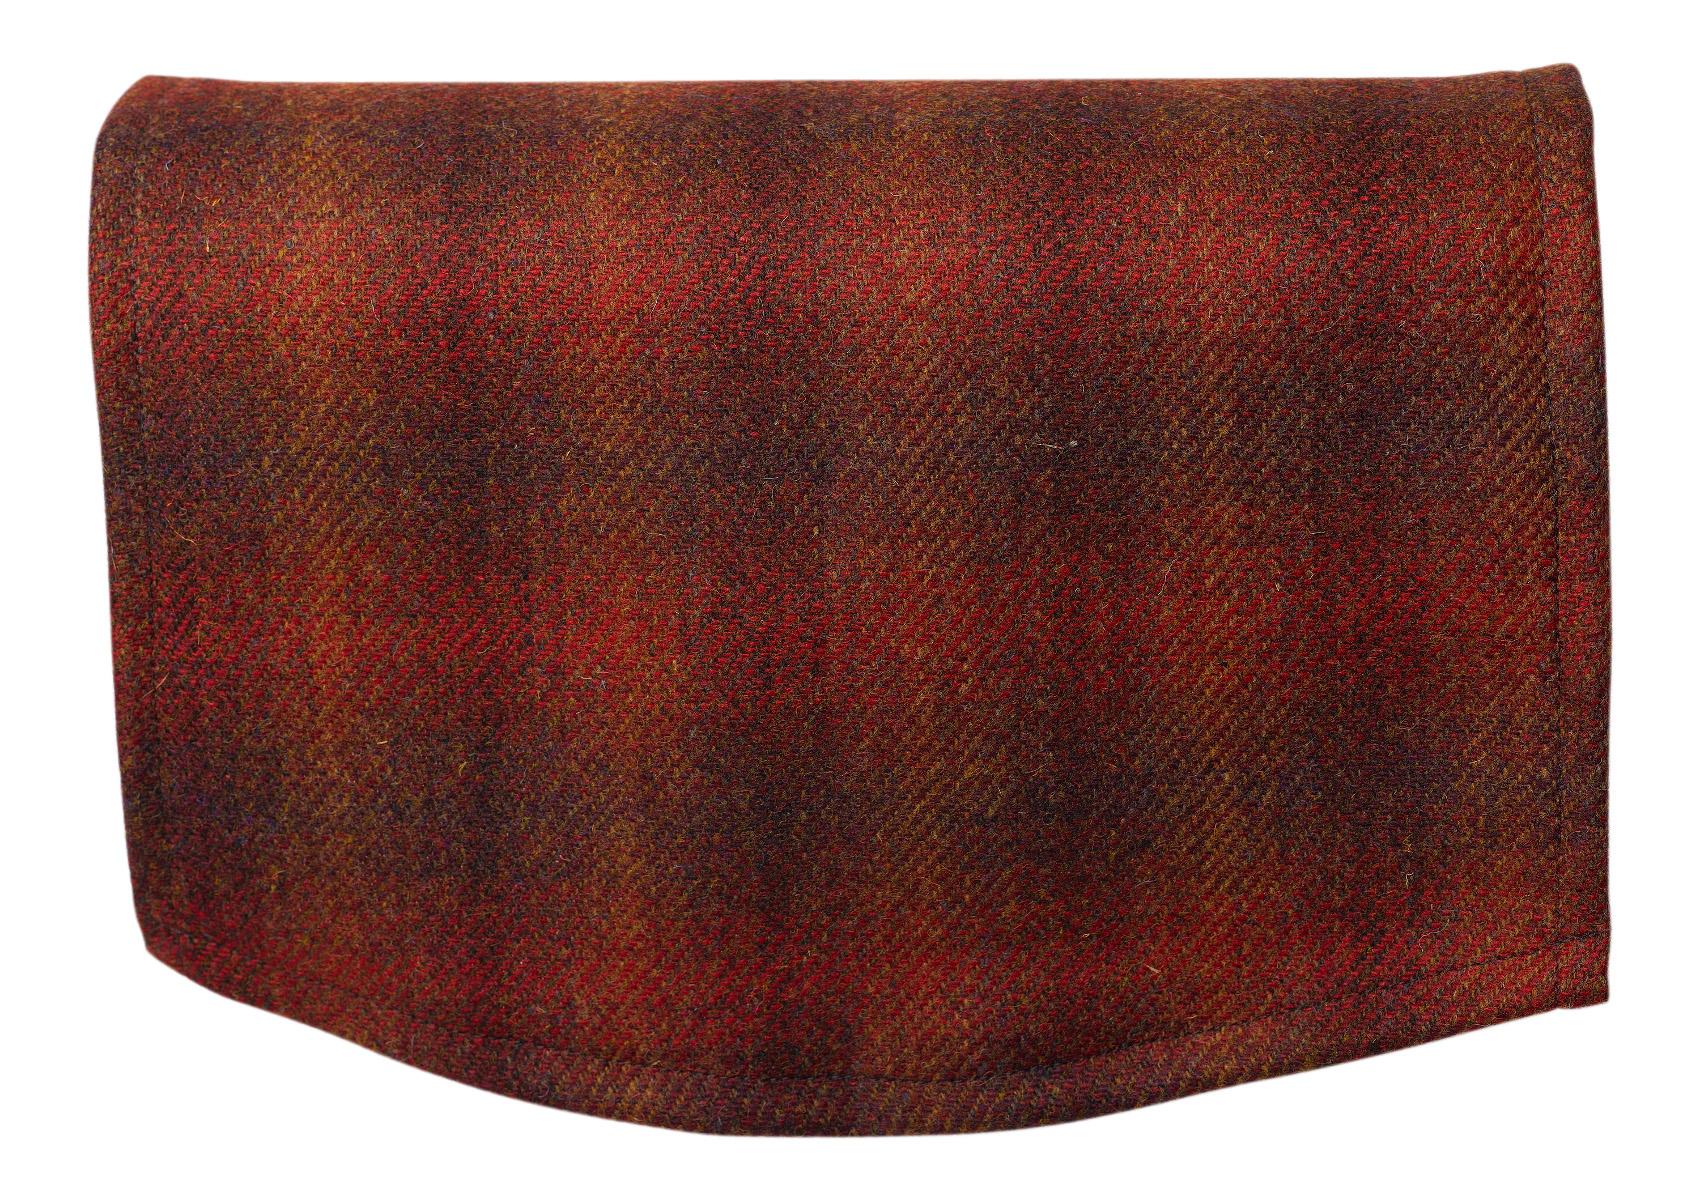 chair covers scotland parson ebay wool sofa icelandic reclaimed oak chewbacca